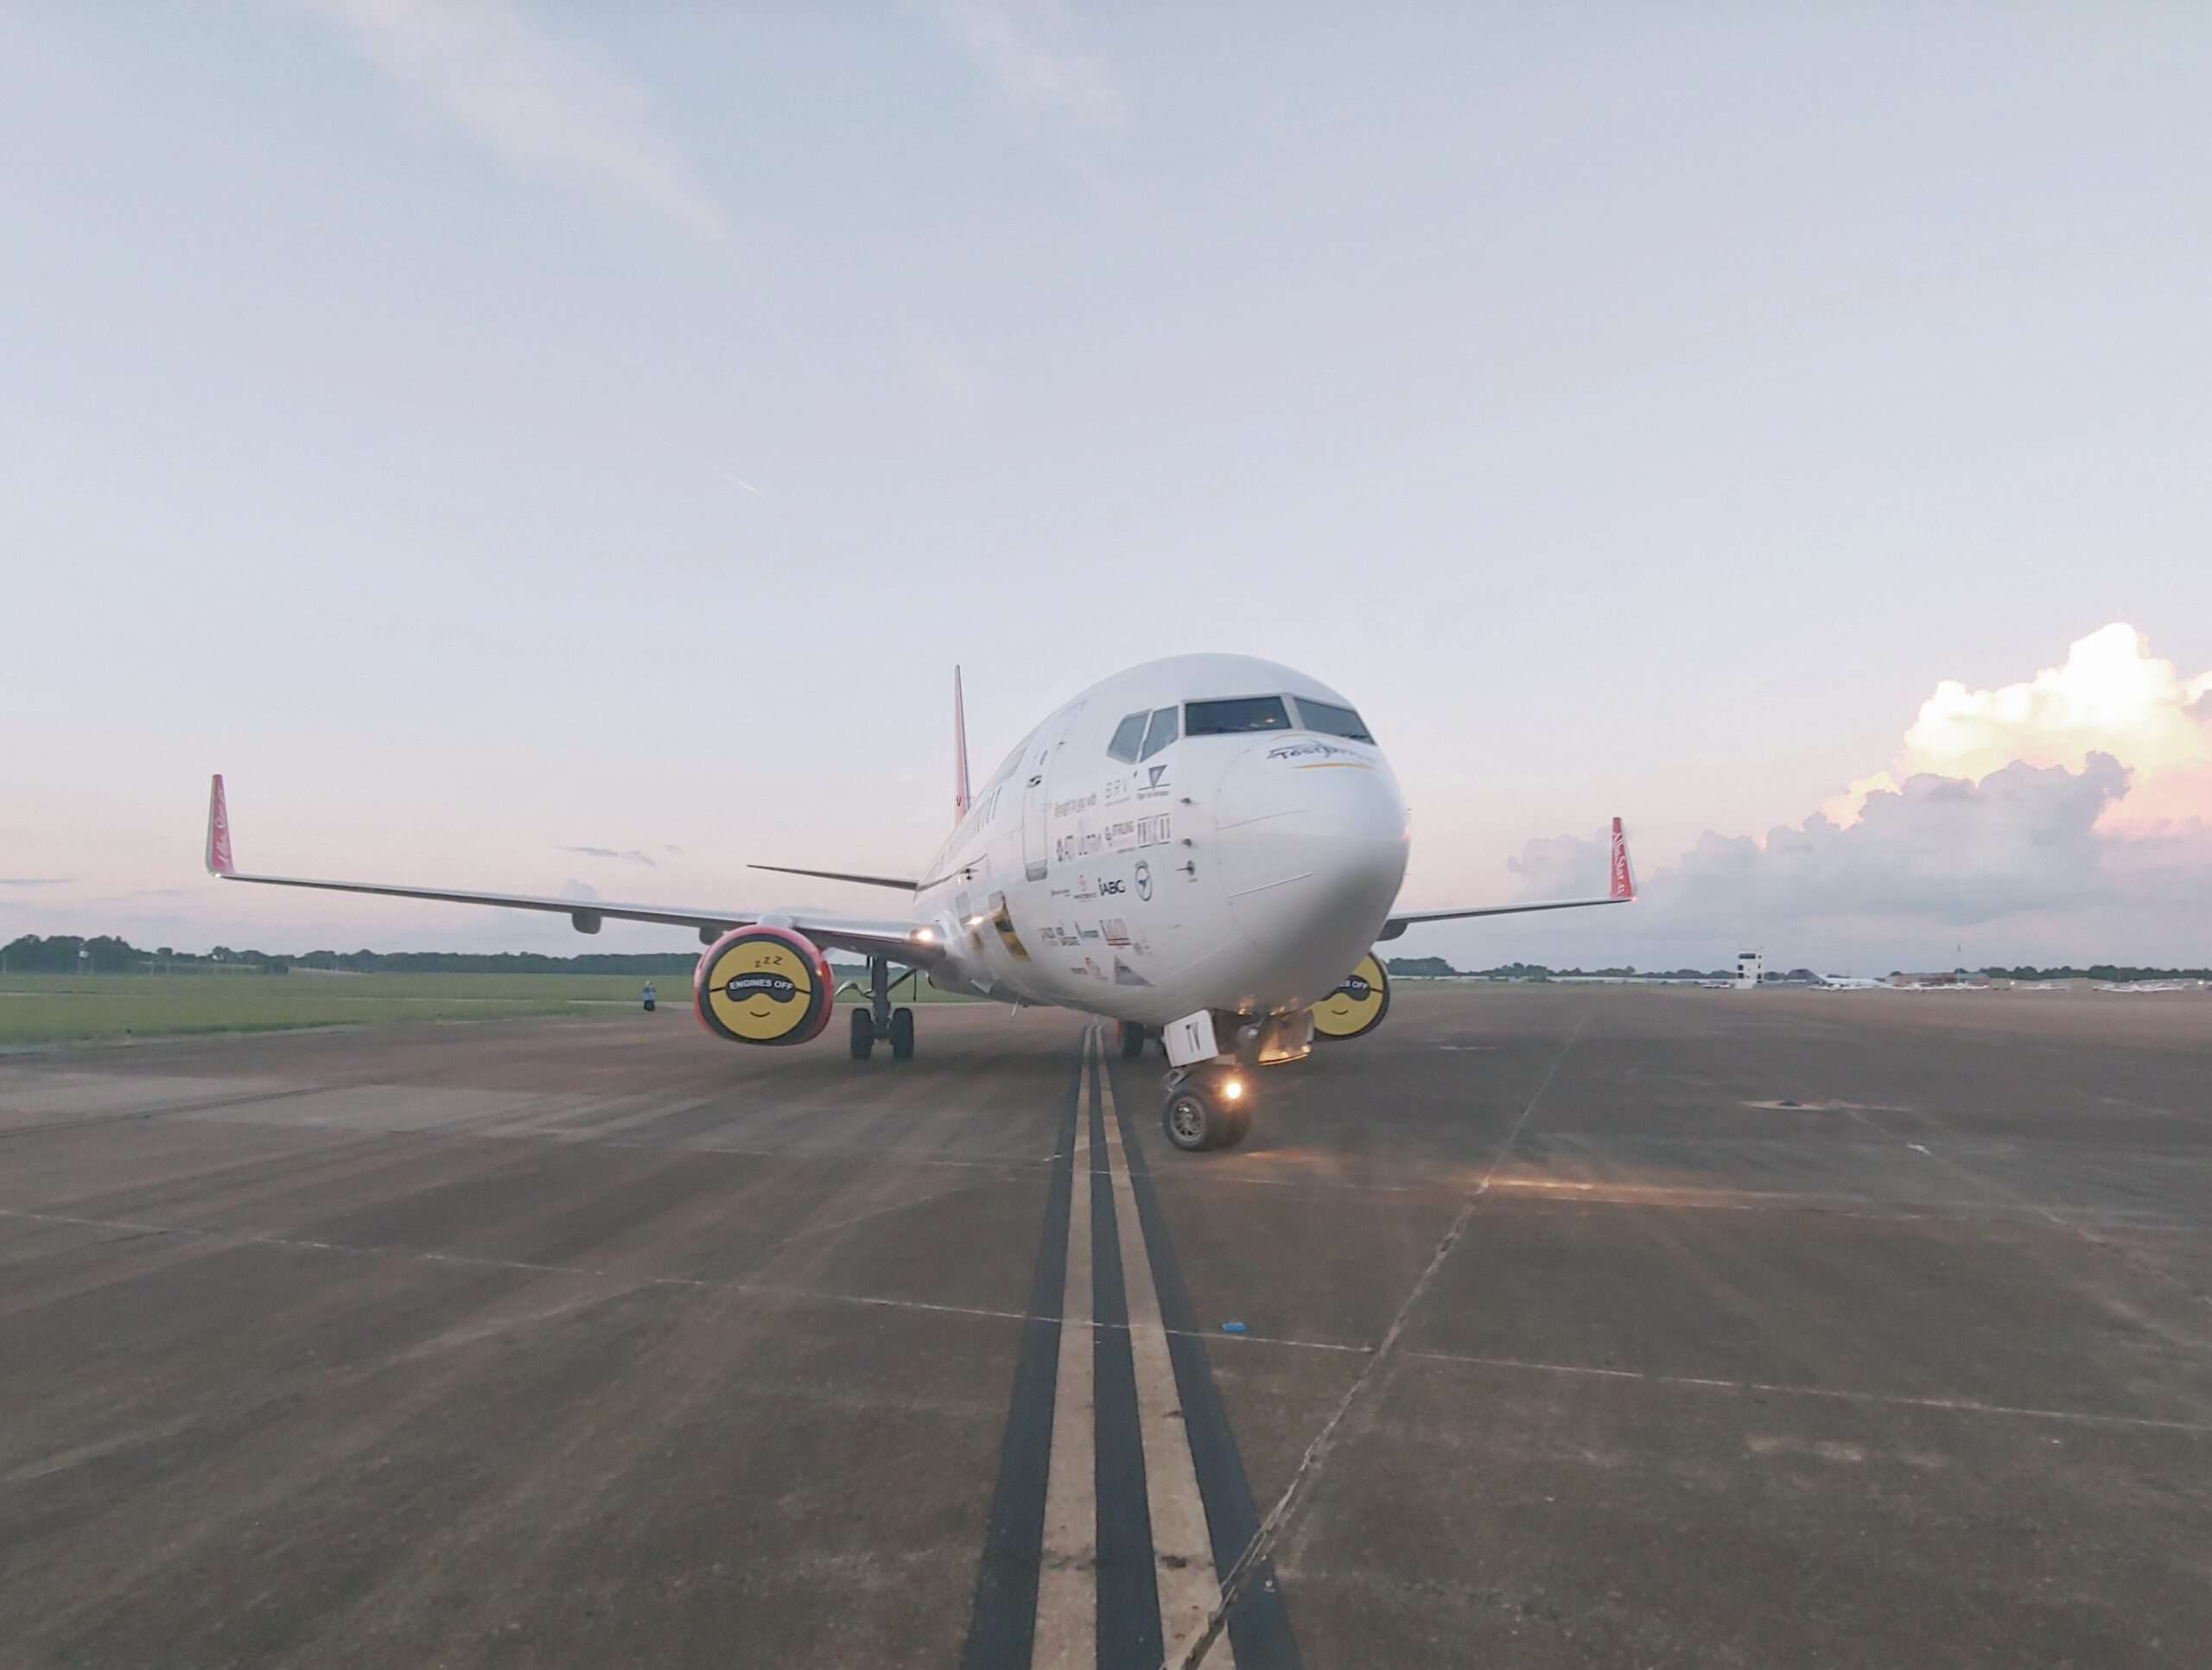 WheelTug Flight Tests